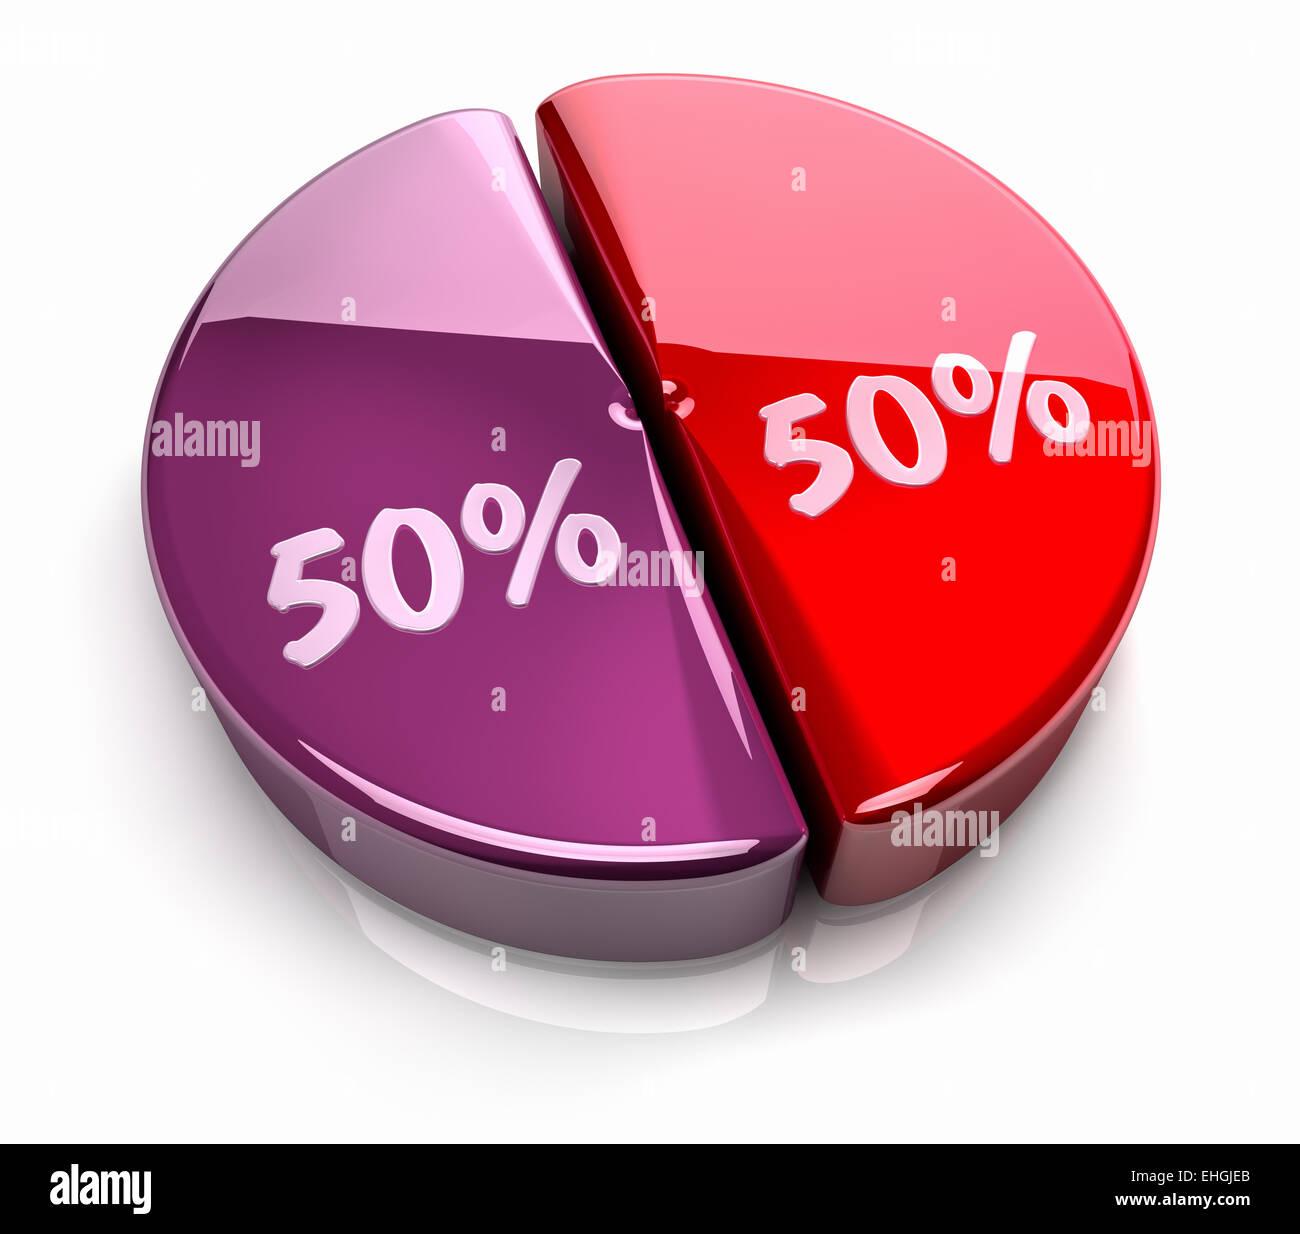 Pie chart 50 50 percent stock photo royalty free image pie chart 50 50 percent nvjuhfo Choice Image